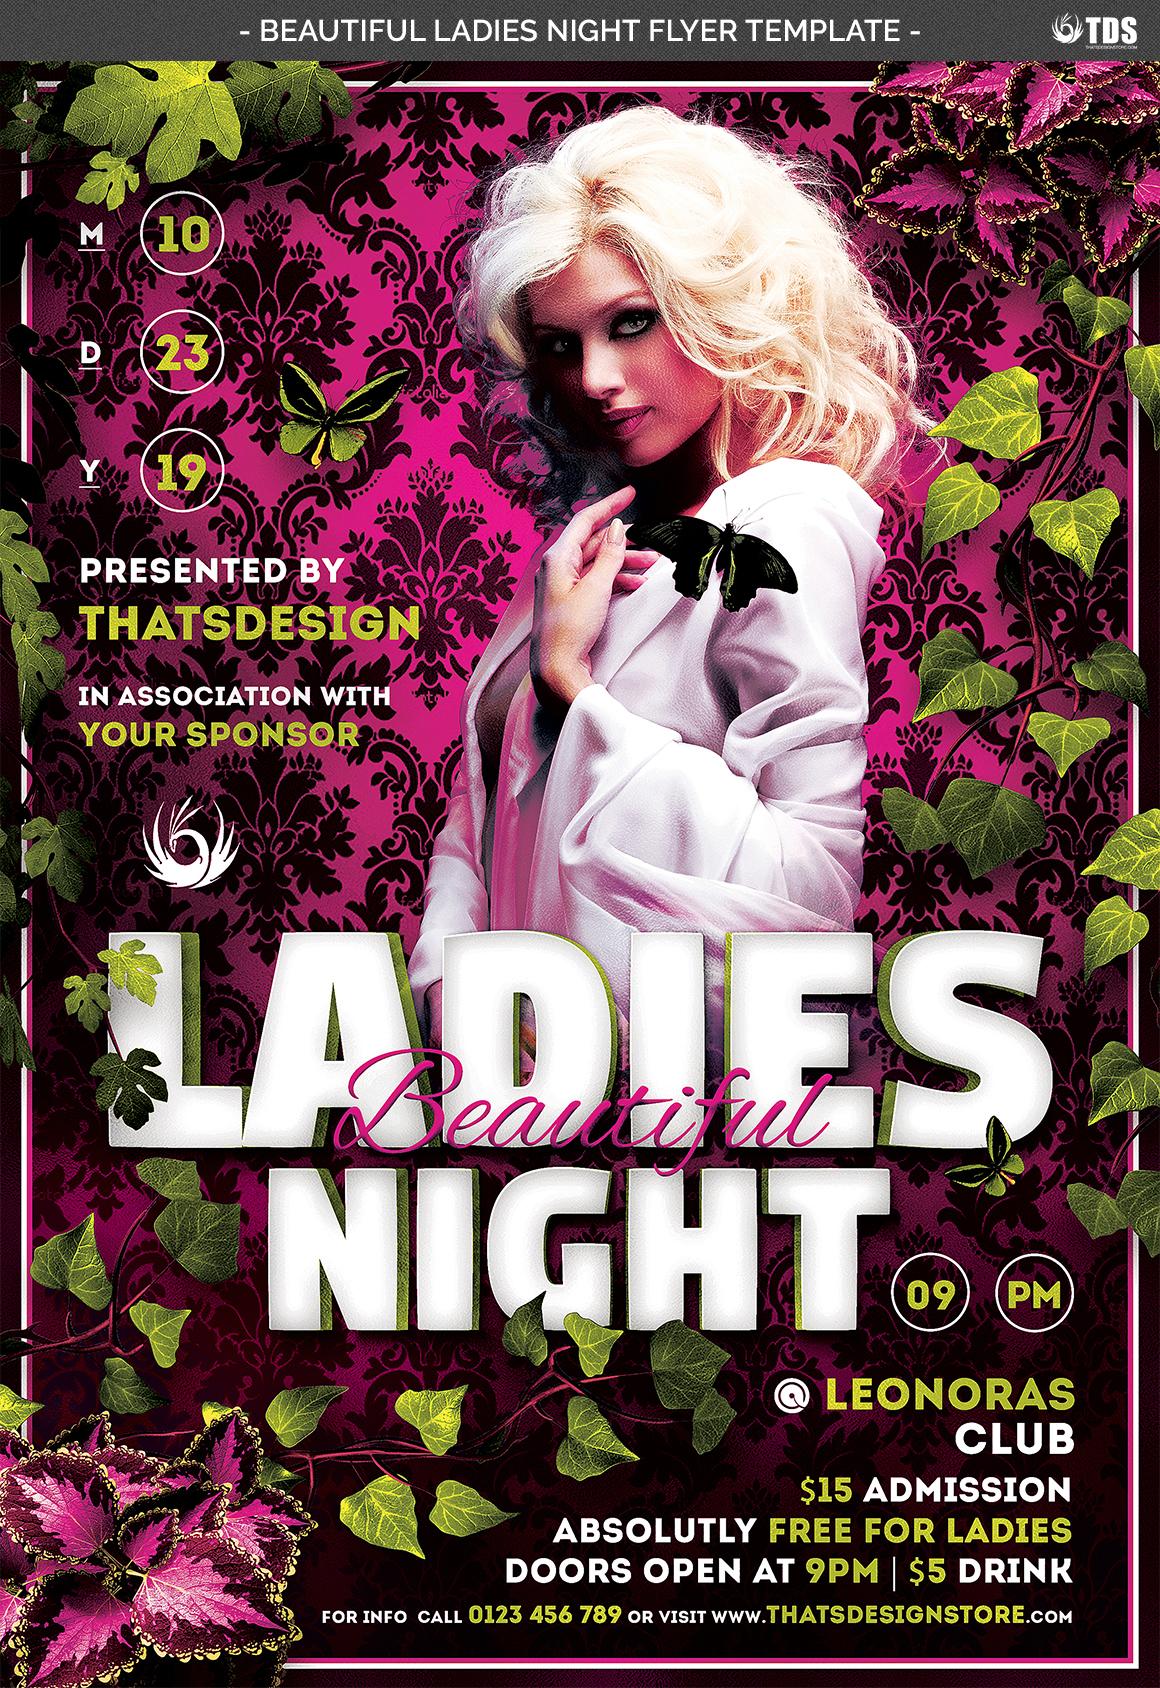 Beautiful Ladies Night Flyer Template example image 4